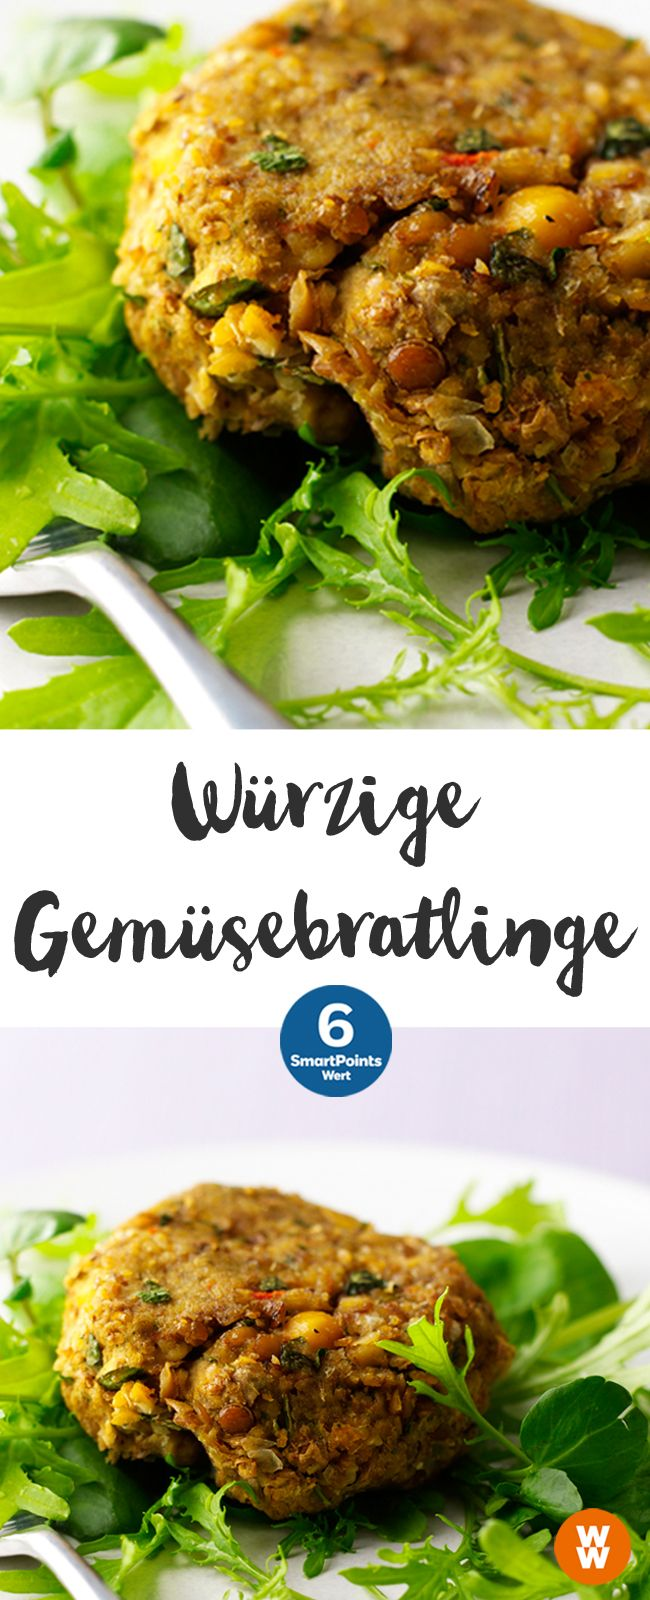 Würzige Gemüsebratlinge | 4 Portionen, 6 SmartPoints/Portion, Weight Watchers, fertig in 40 min. #veganerezeptemittag